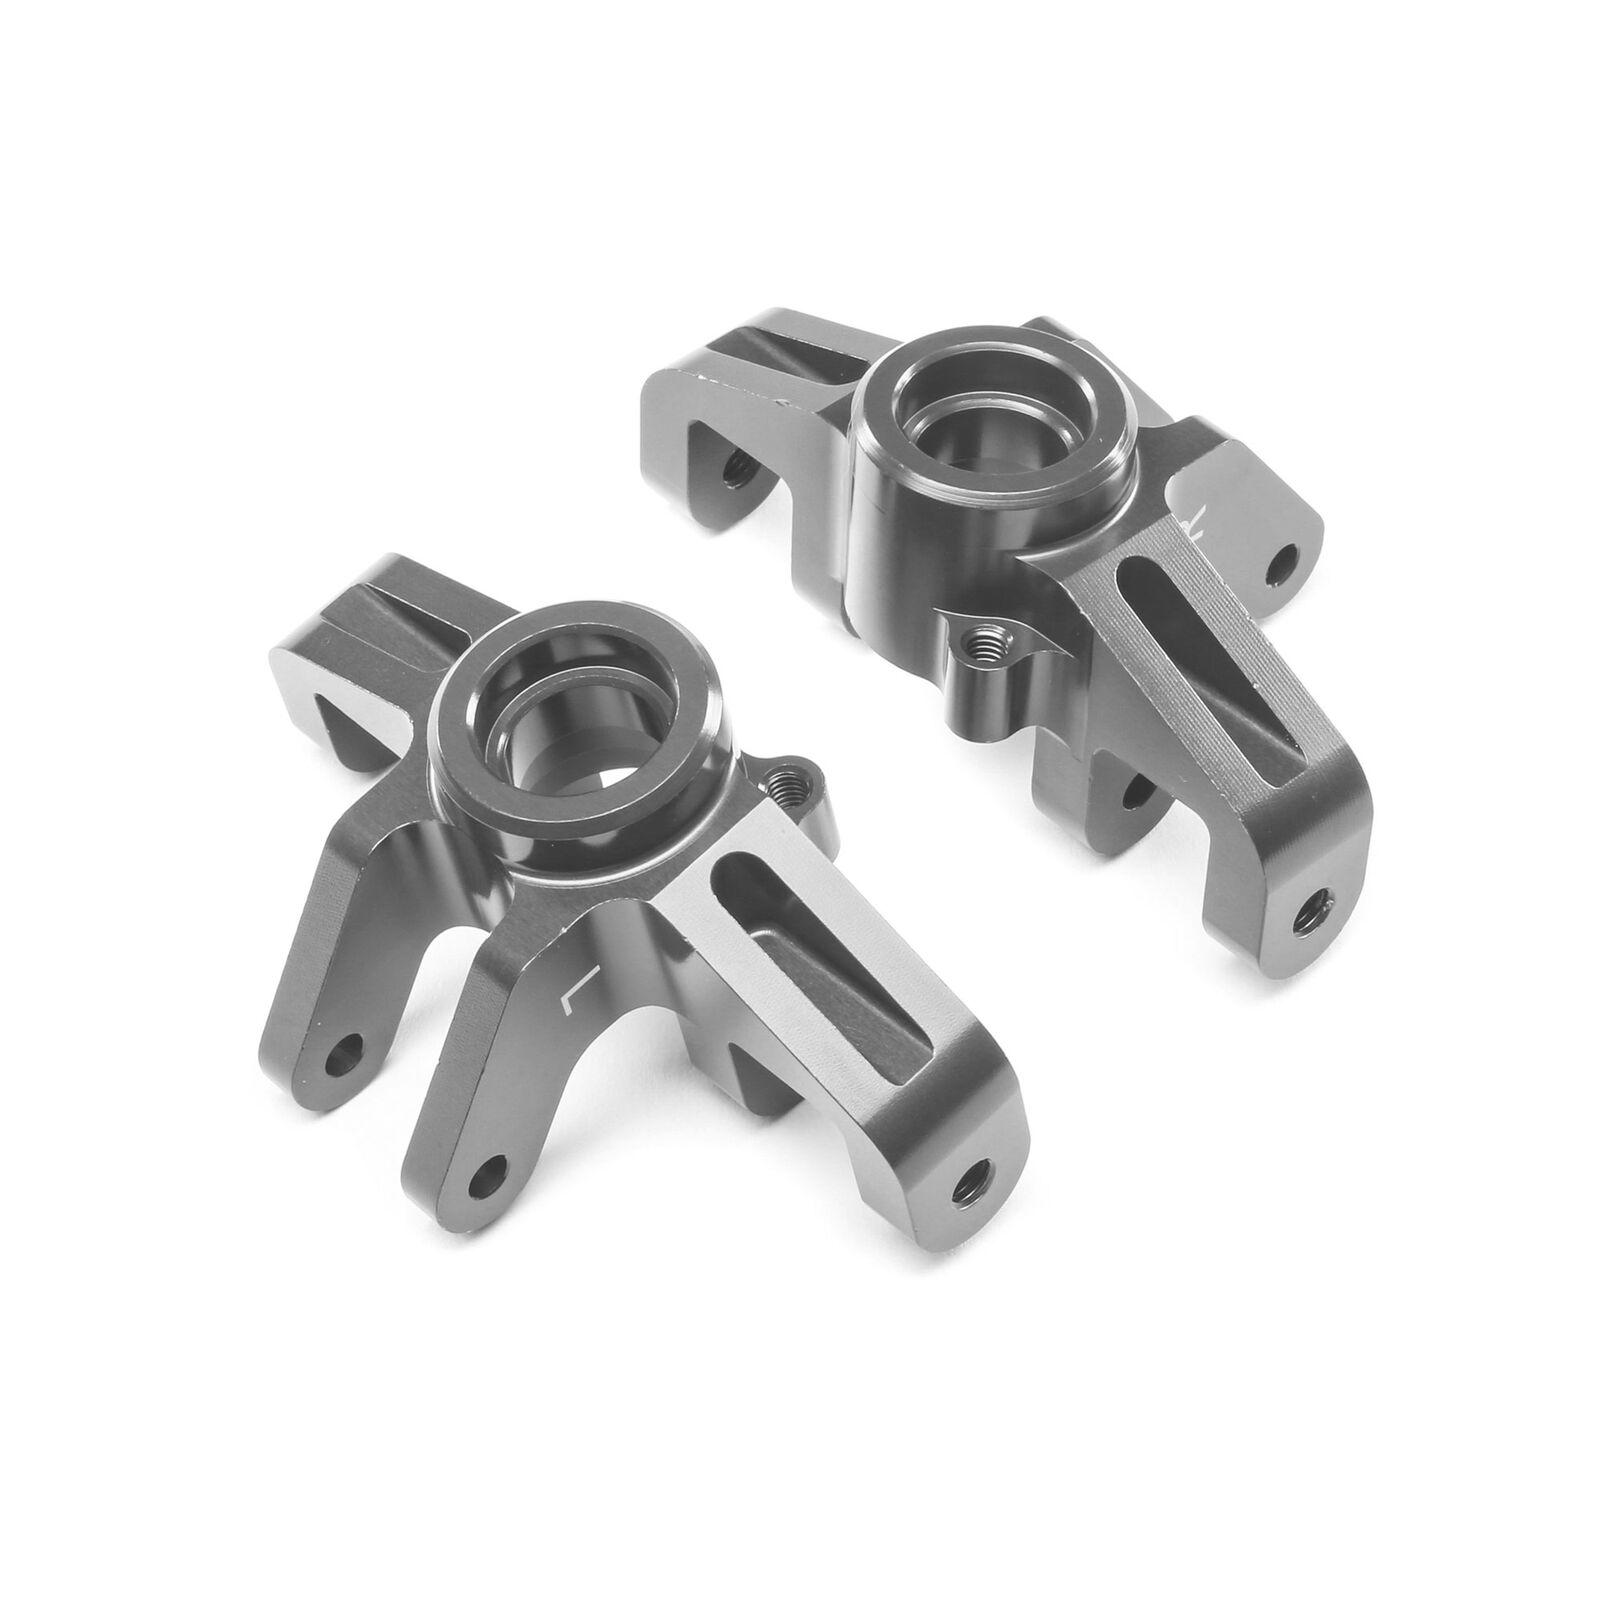 Aluminum Front Spindle Set: Super Baja Rey